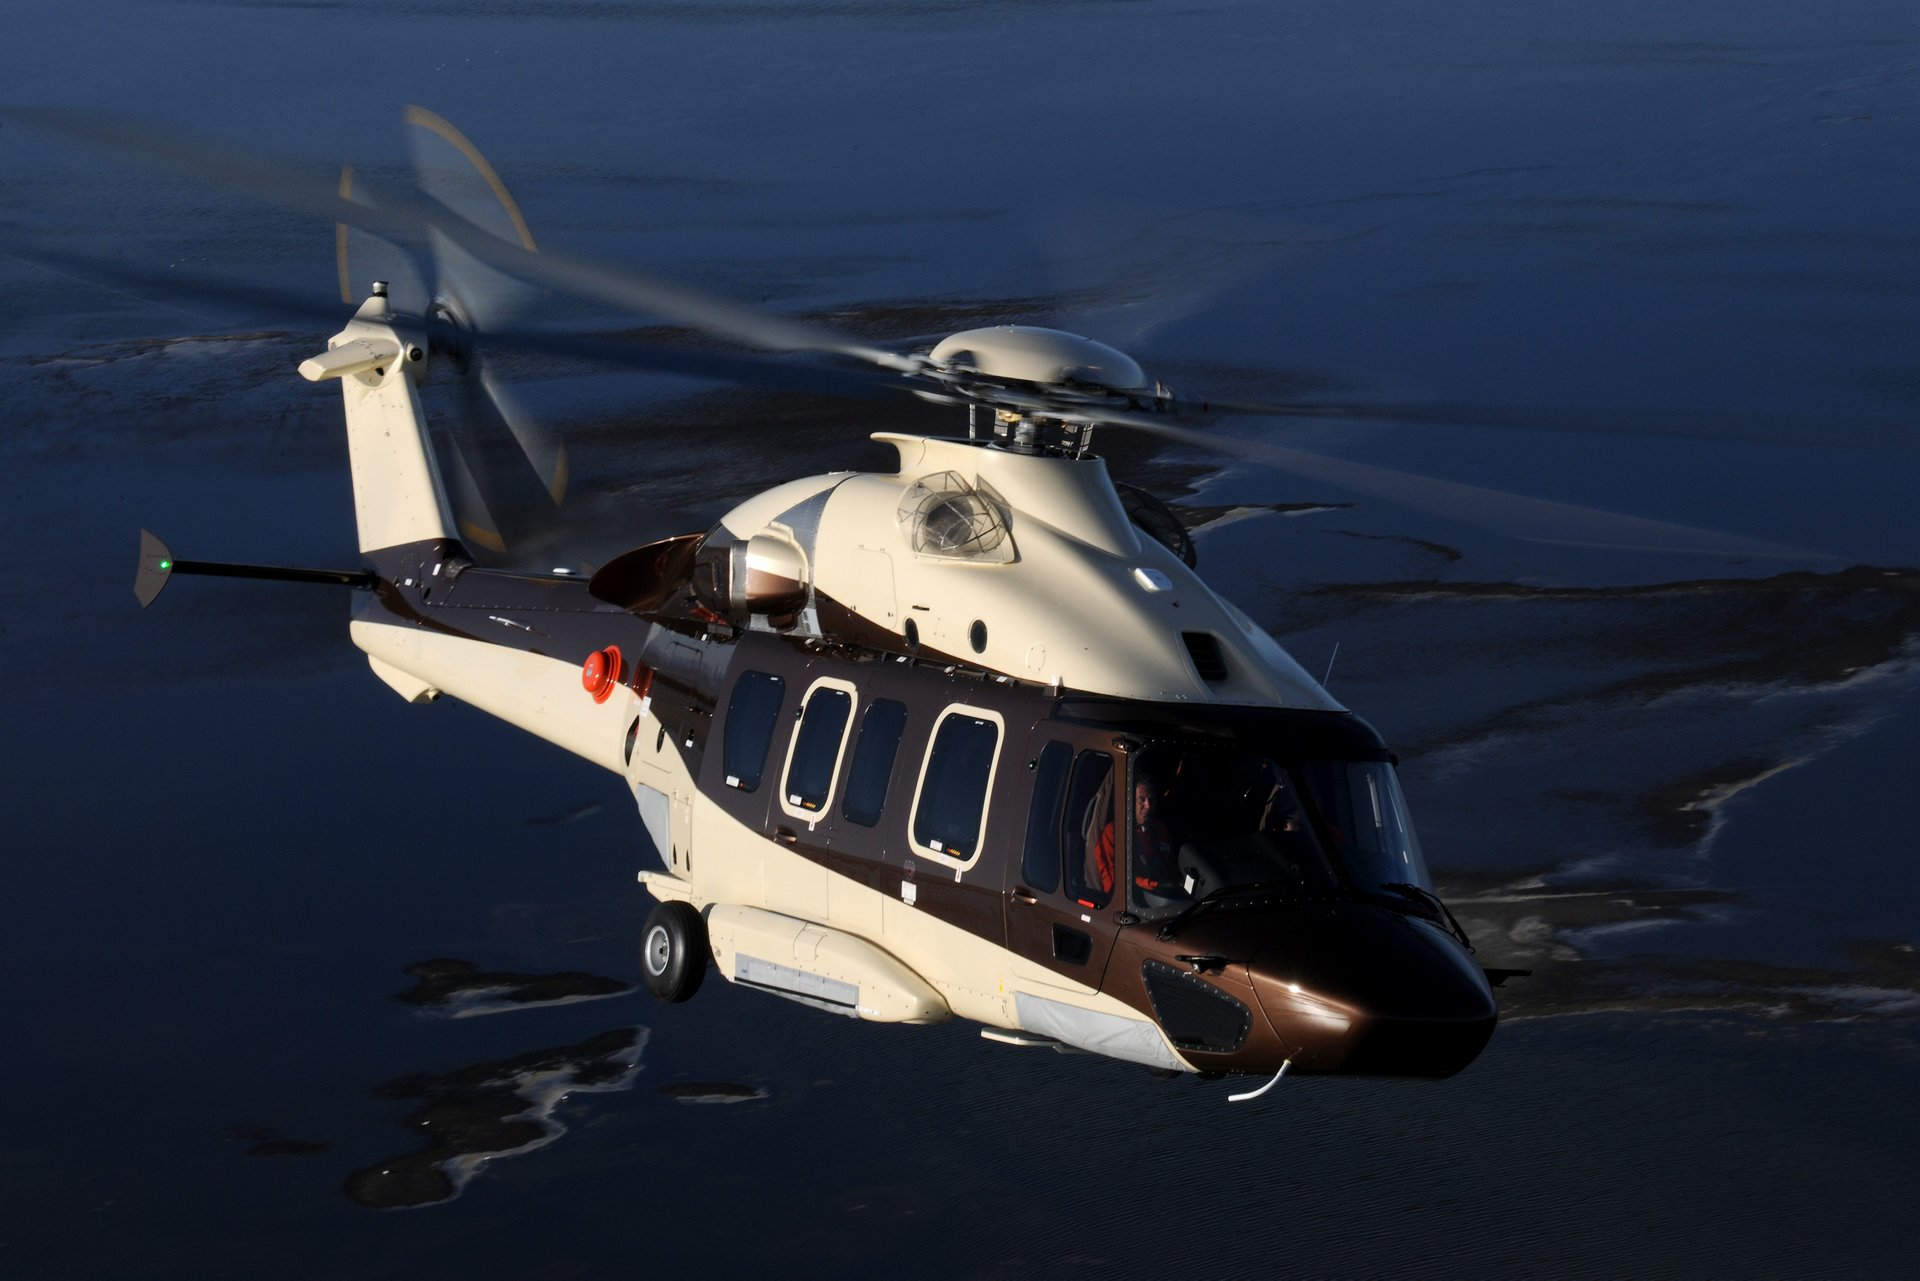 H175 in VIP configuration